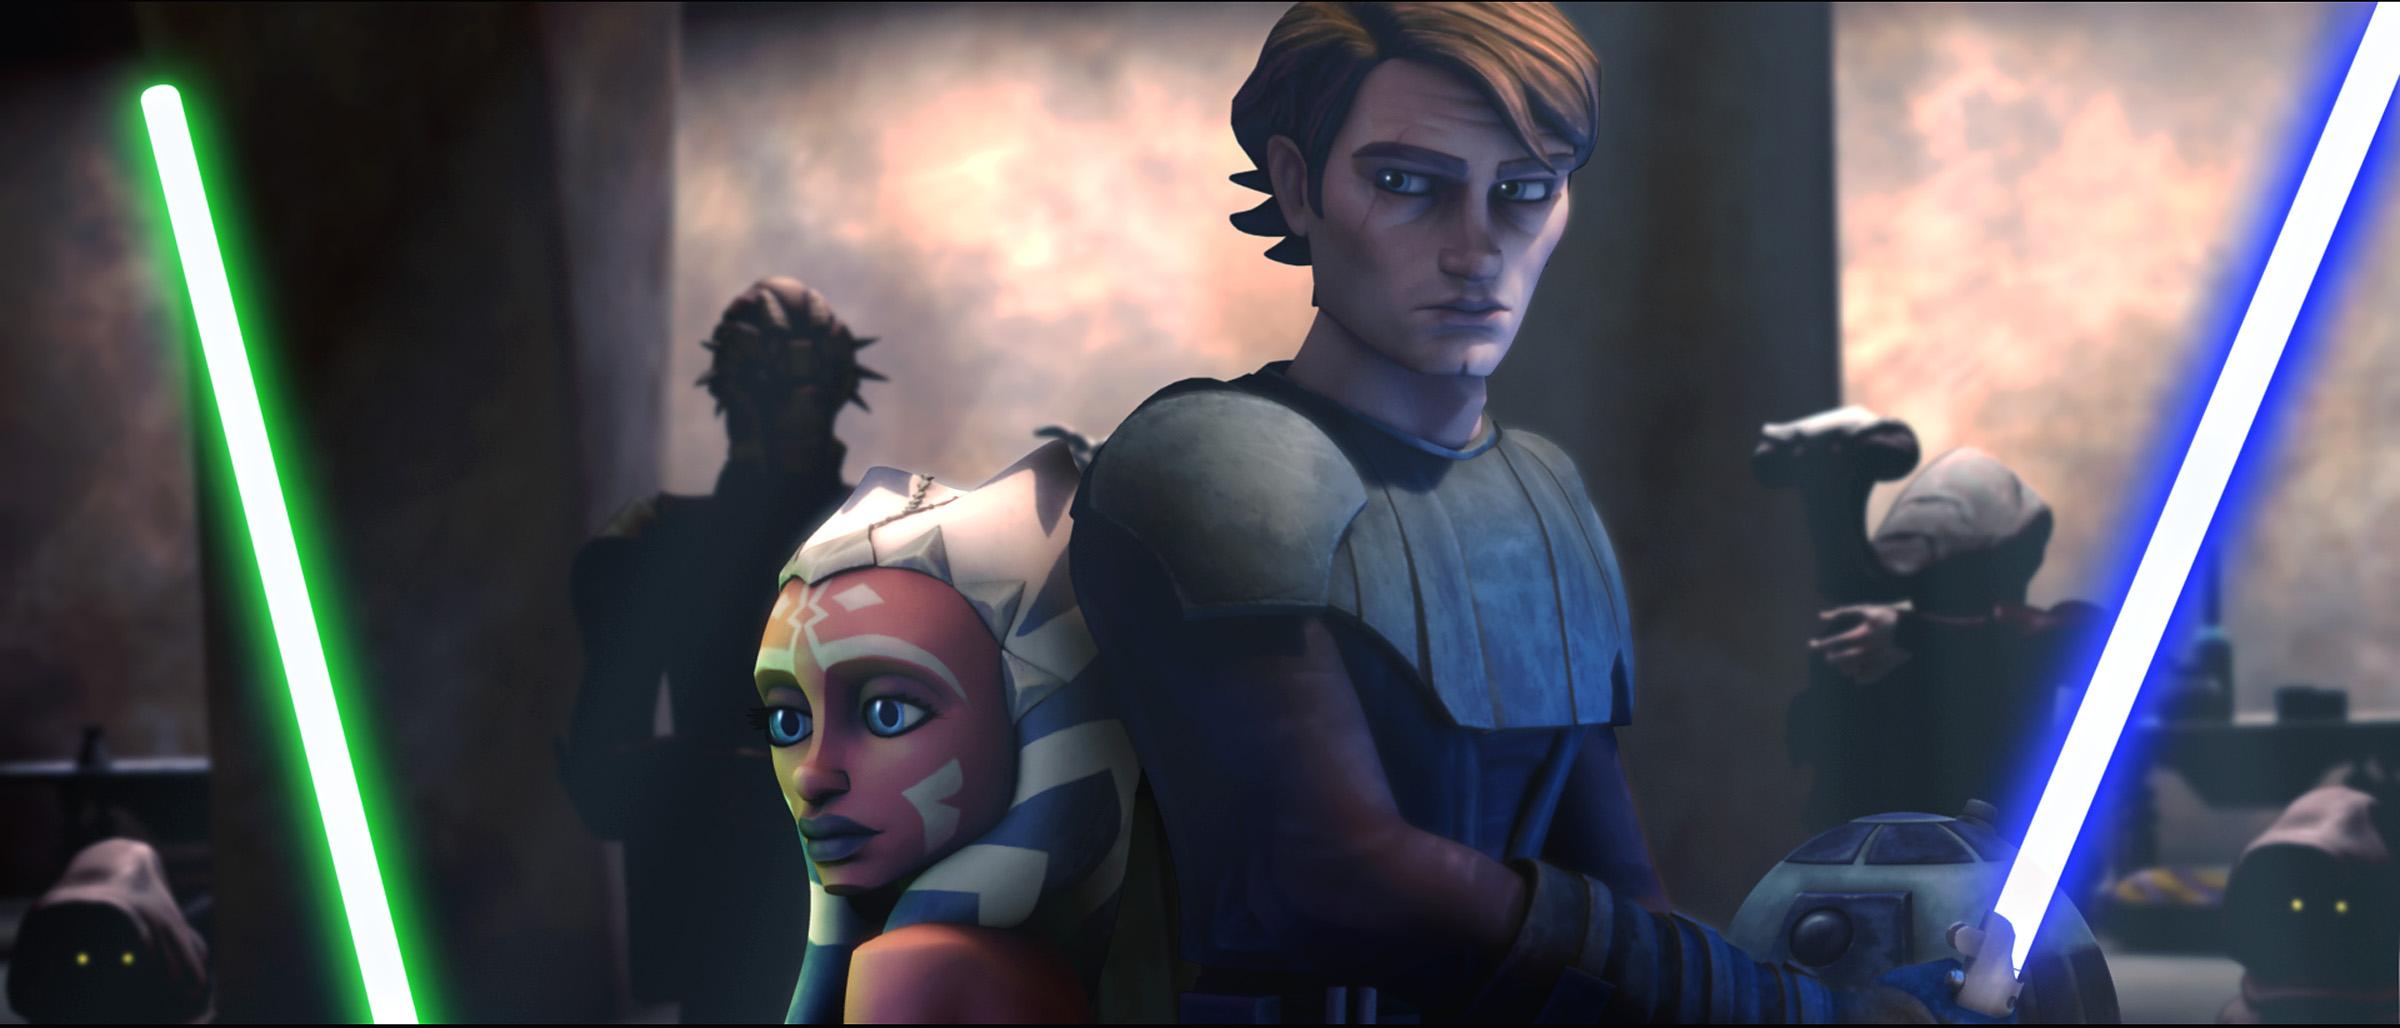 Звёздные войны: Войны клонов, кадр № 1